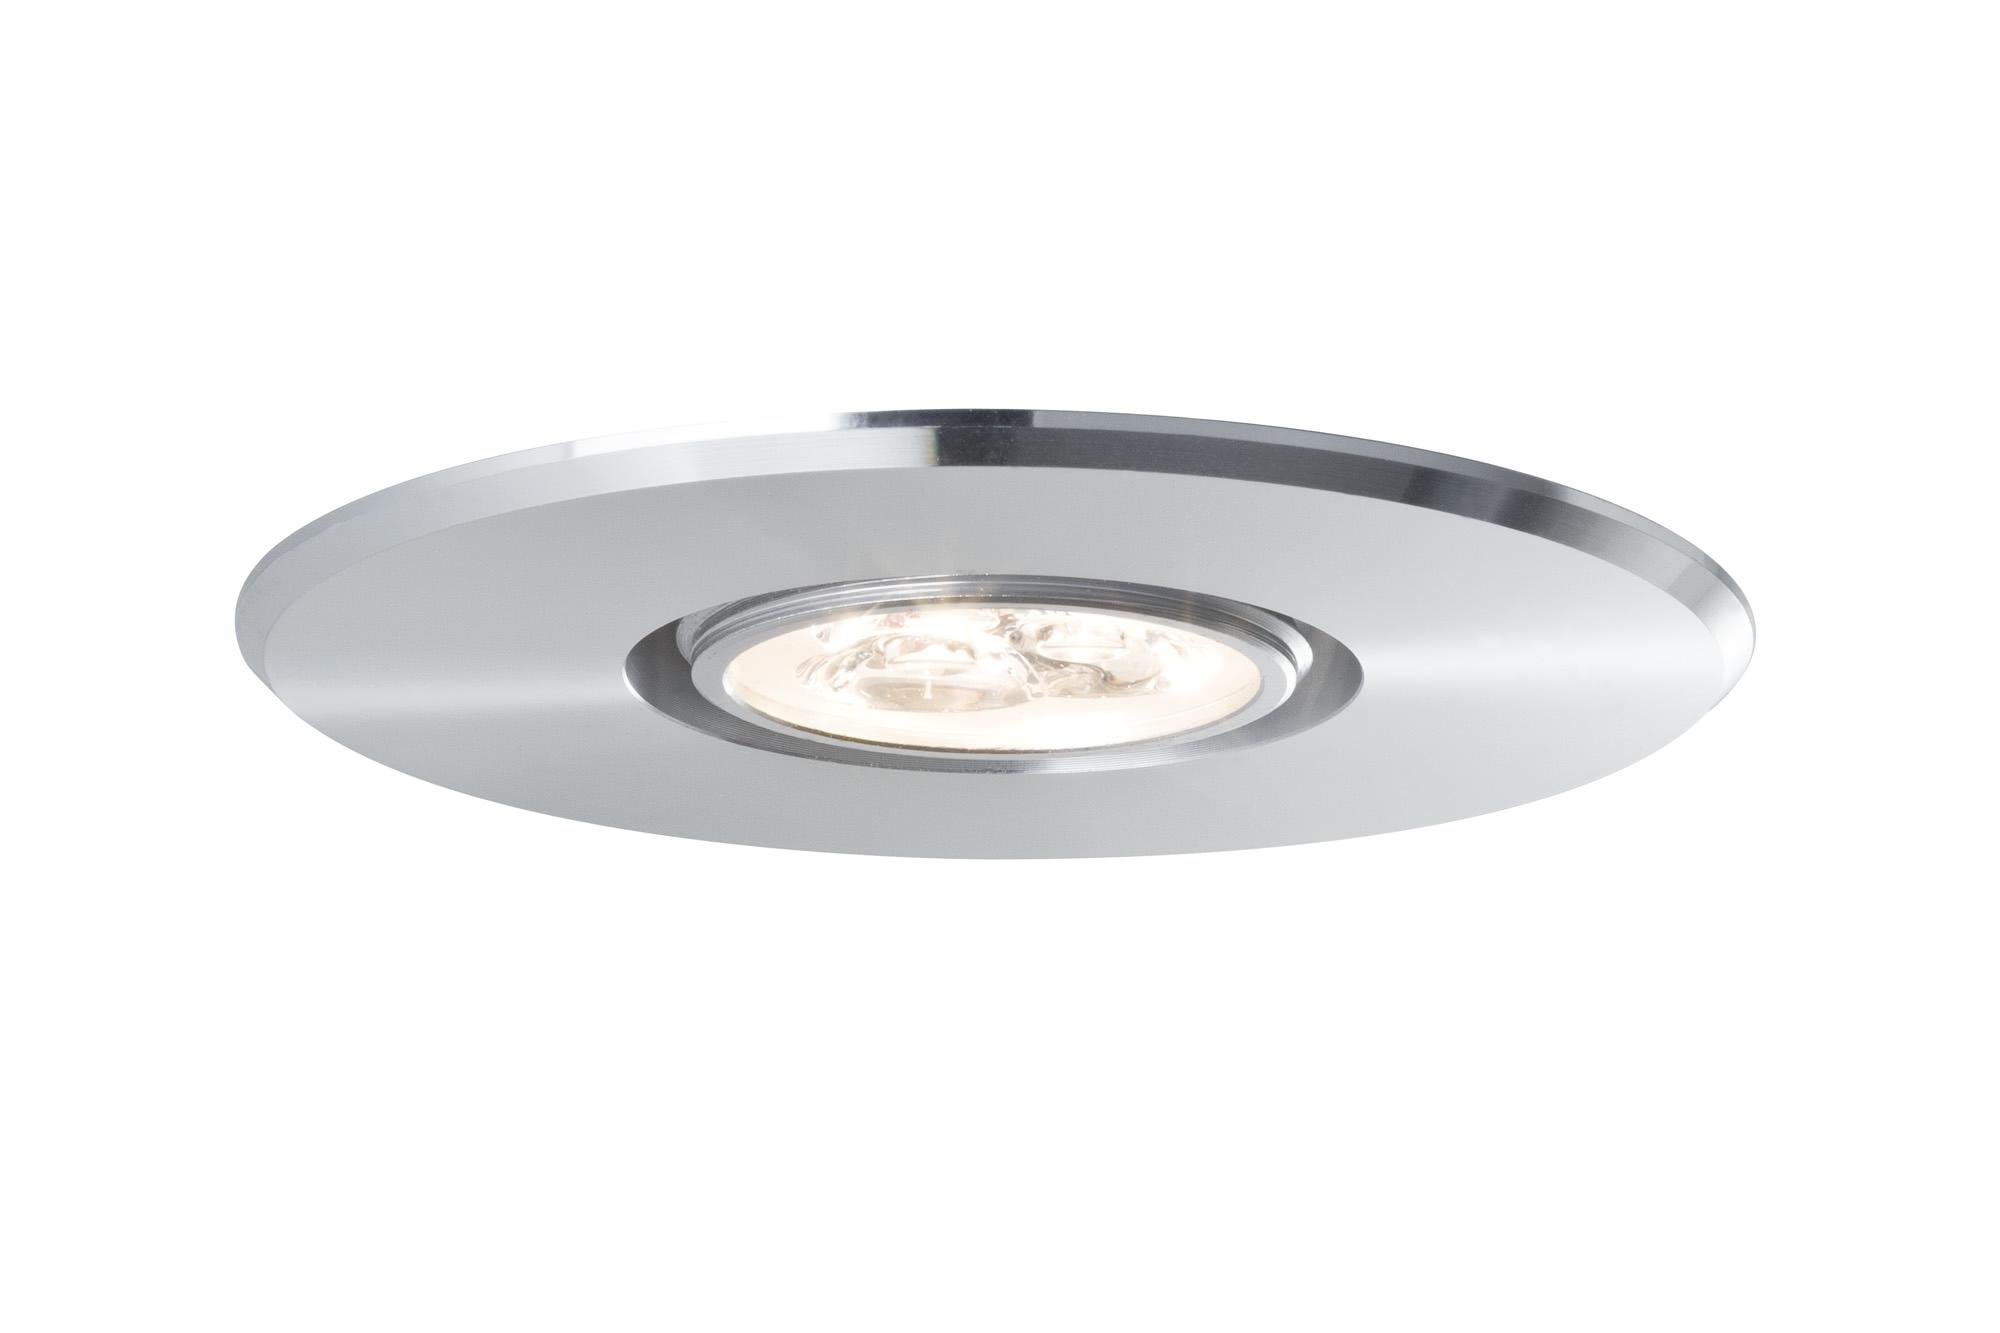 Paulmann. 92570 Светильник DecoSystems Basic LED,1x 3 W LED 350 mA, 230 V, алюминий